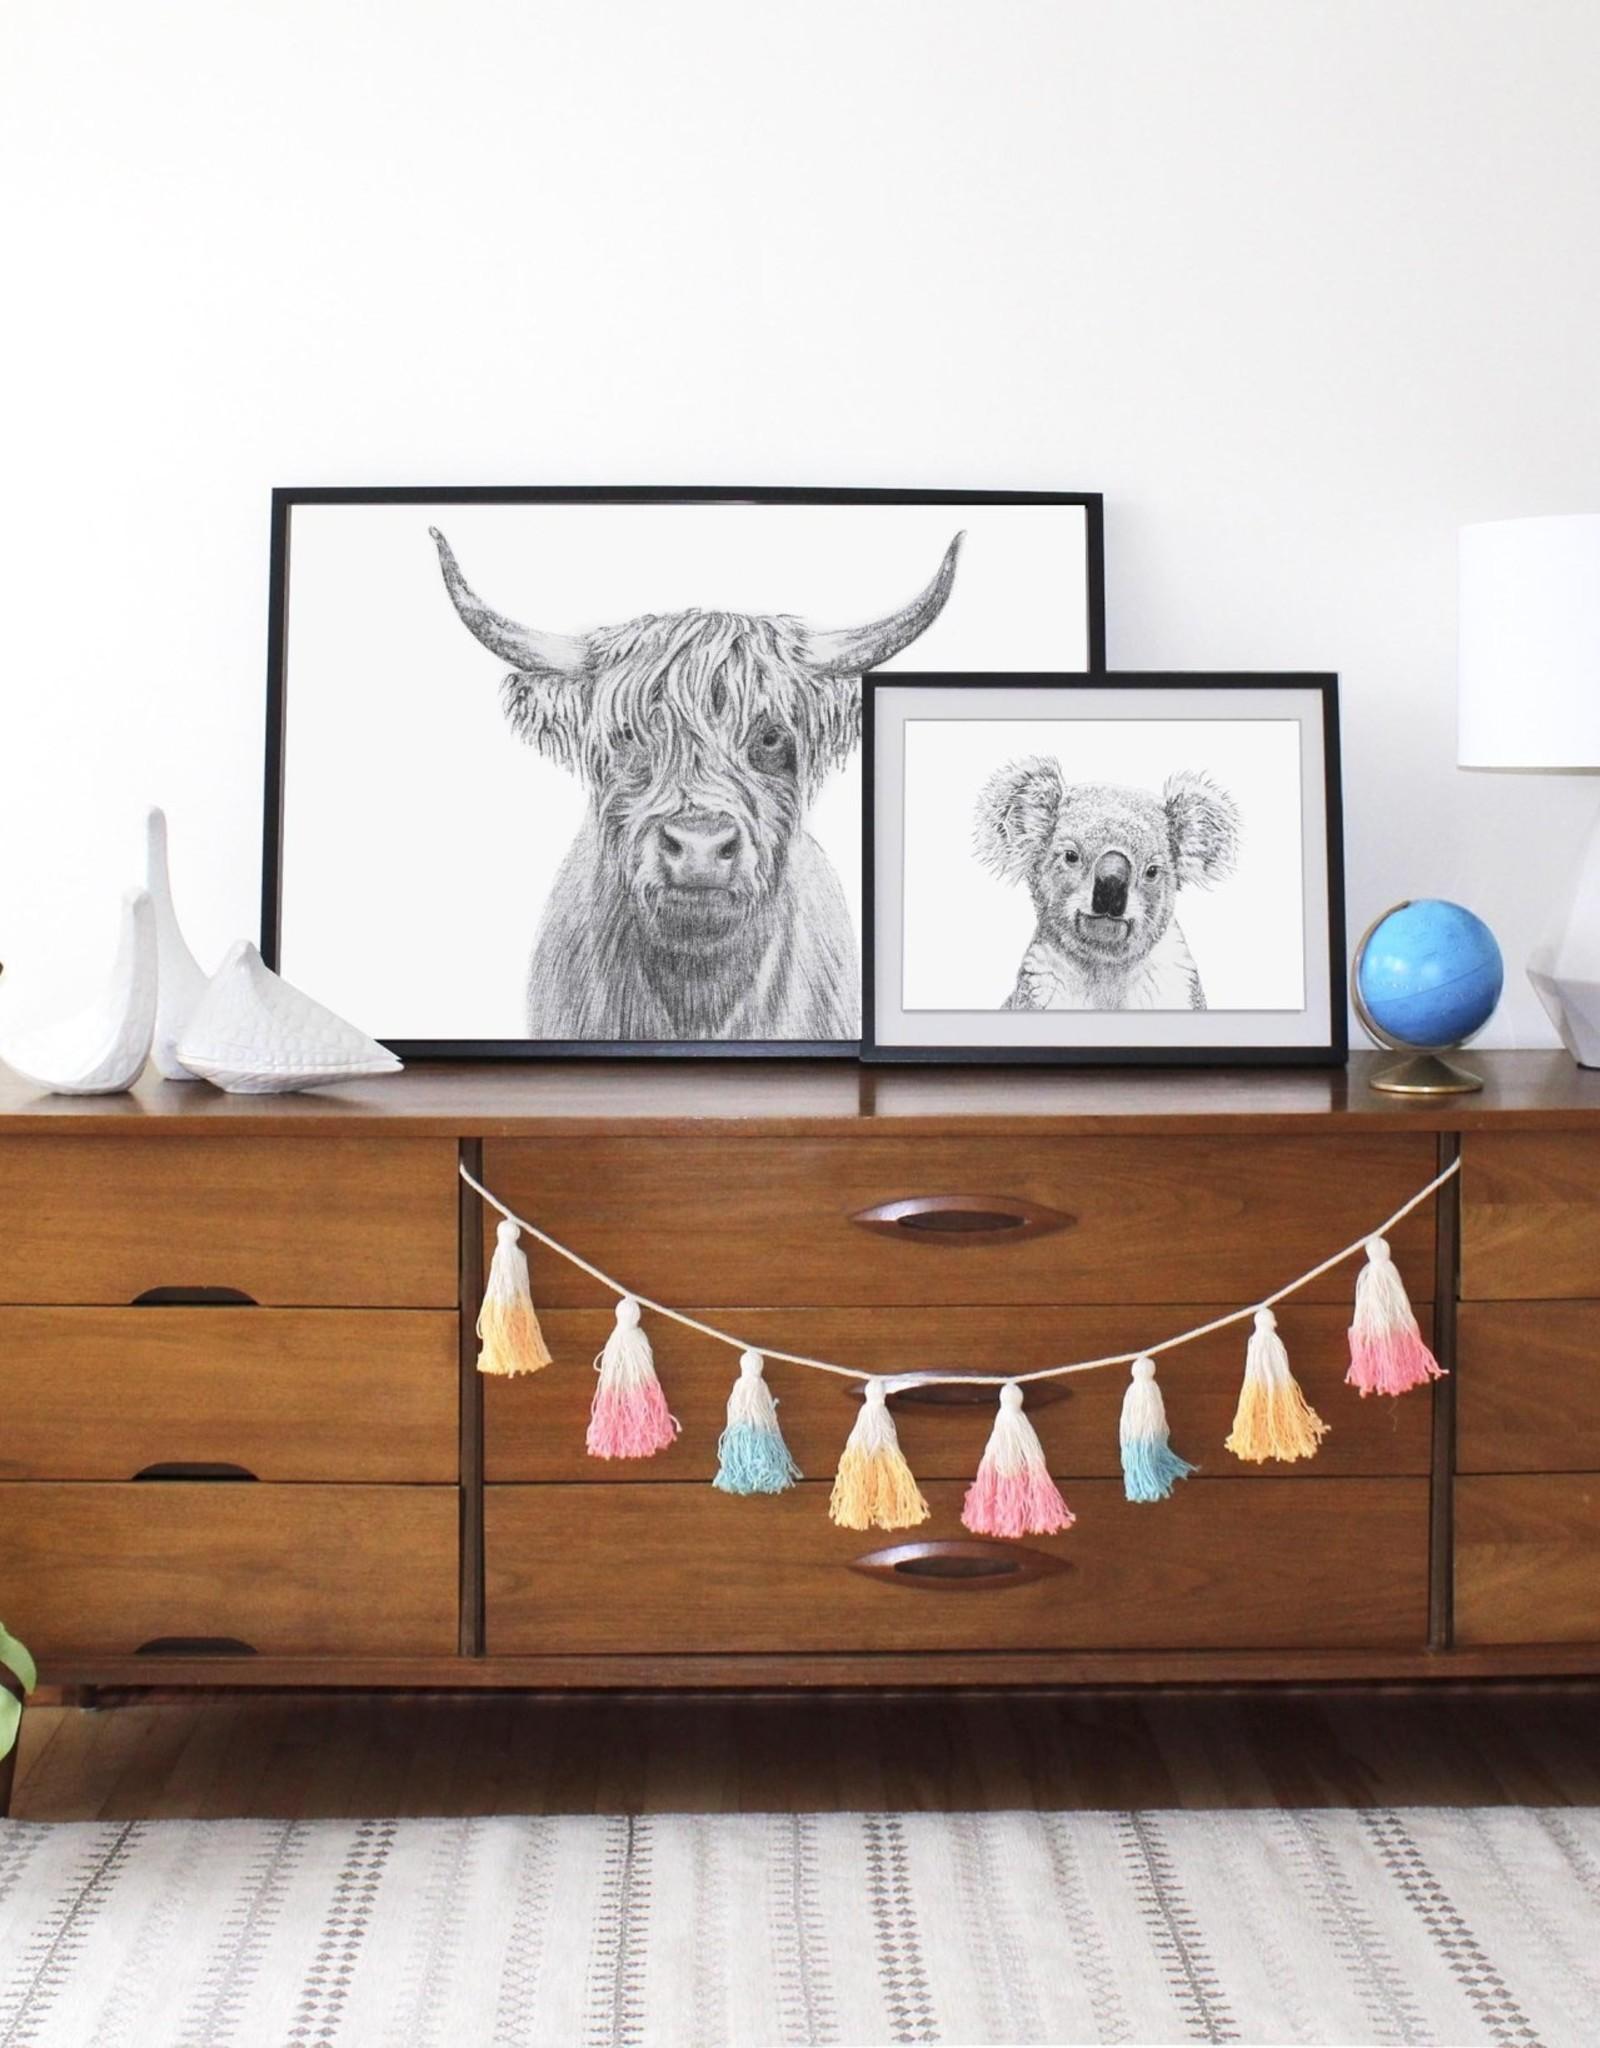 Le nid atelier Illustration - Highland Cow